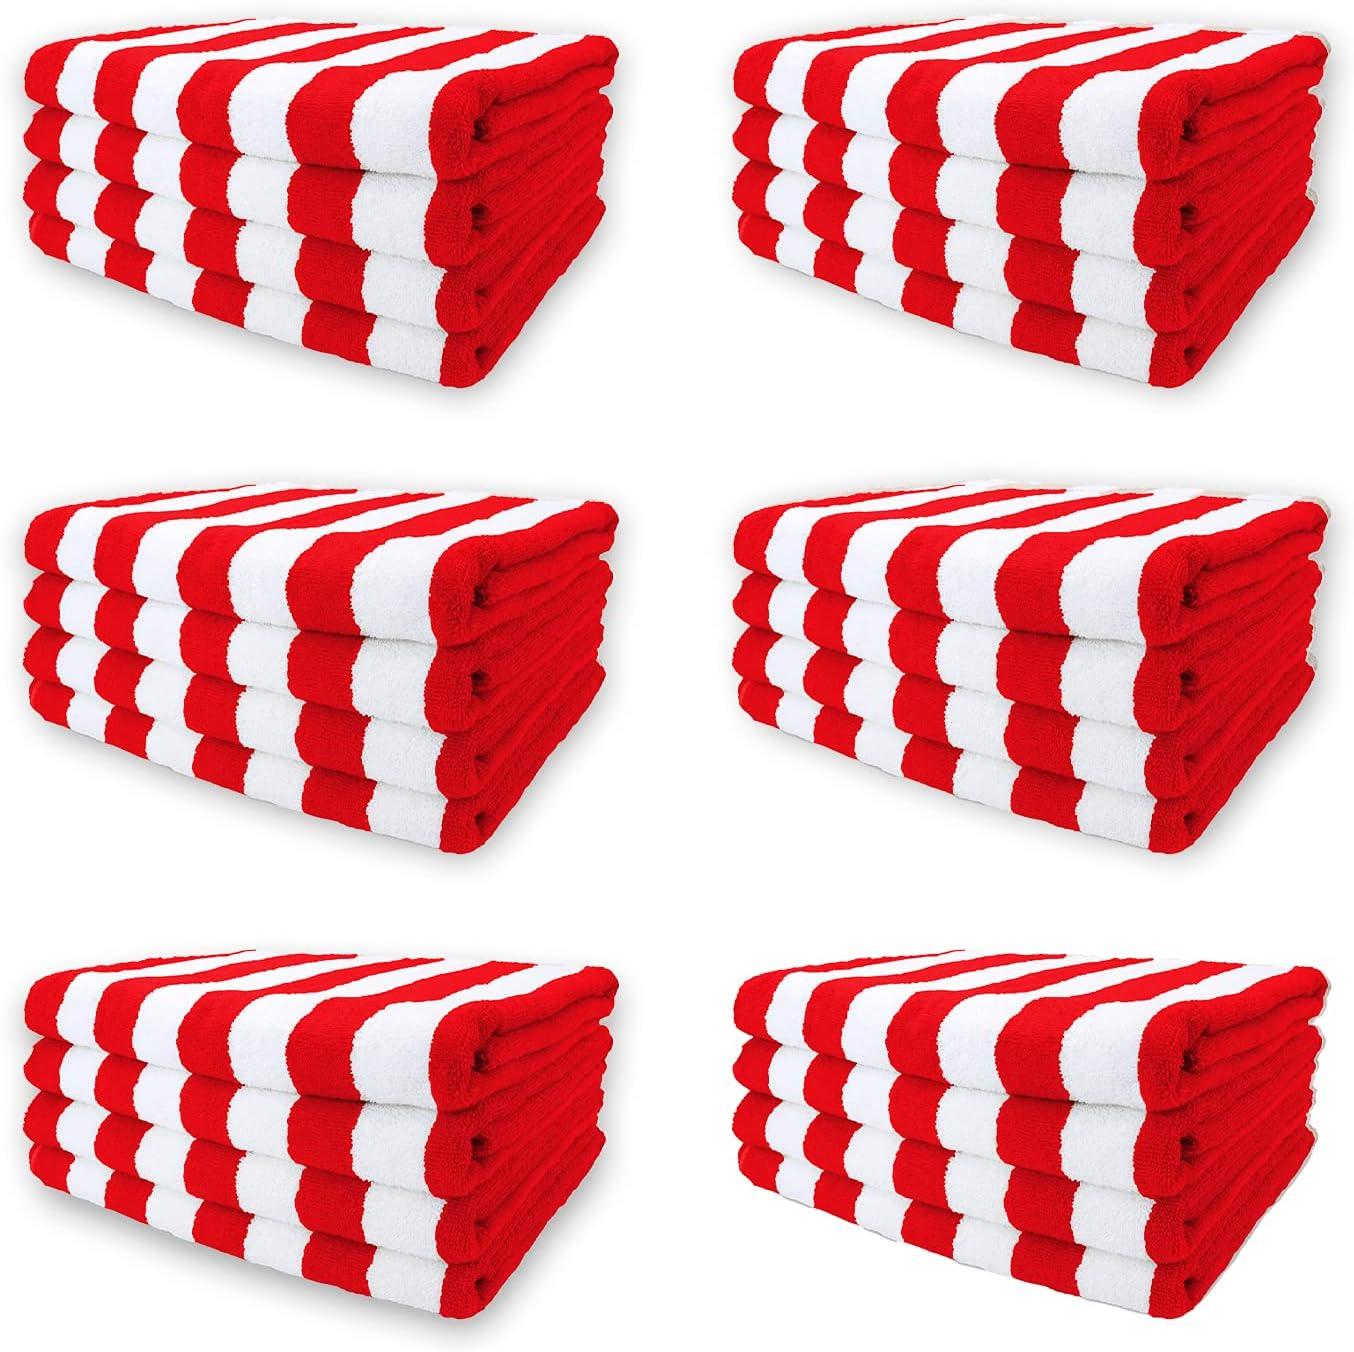 Arkwright Oversized Beach Towels (35x70, 24 Bulk Case), Ringspun Cotton Double Yarn Strength, California Cabana Beach Towel, Pool Towel, Bath Towel (Red)